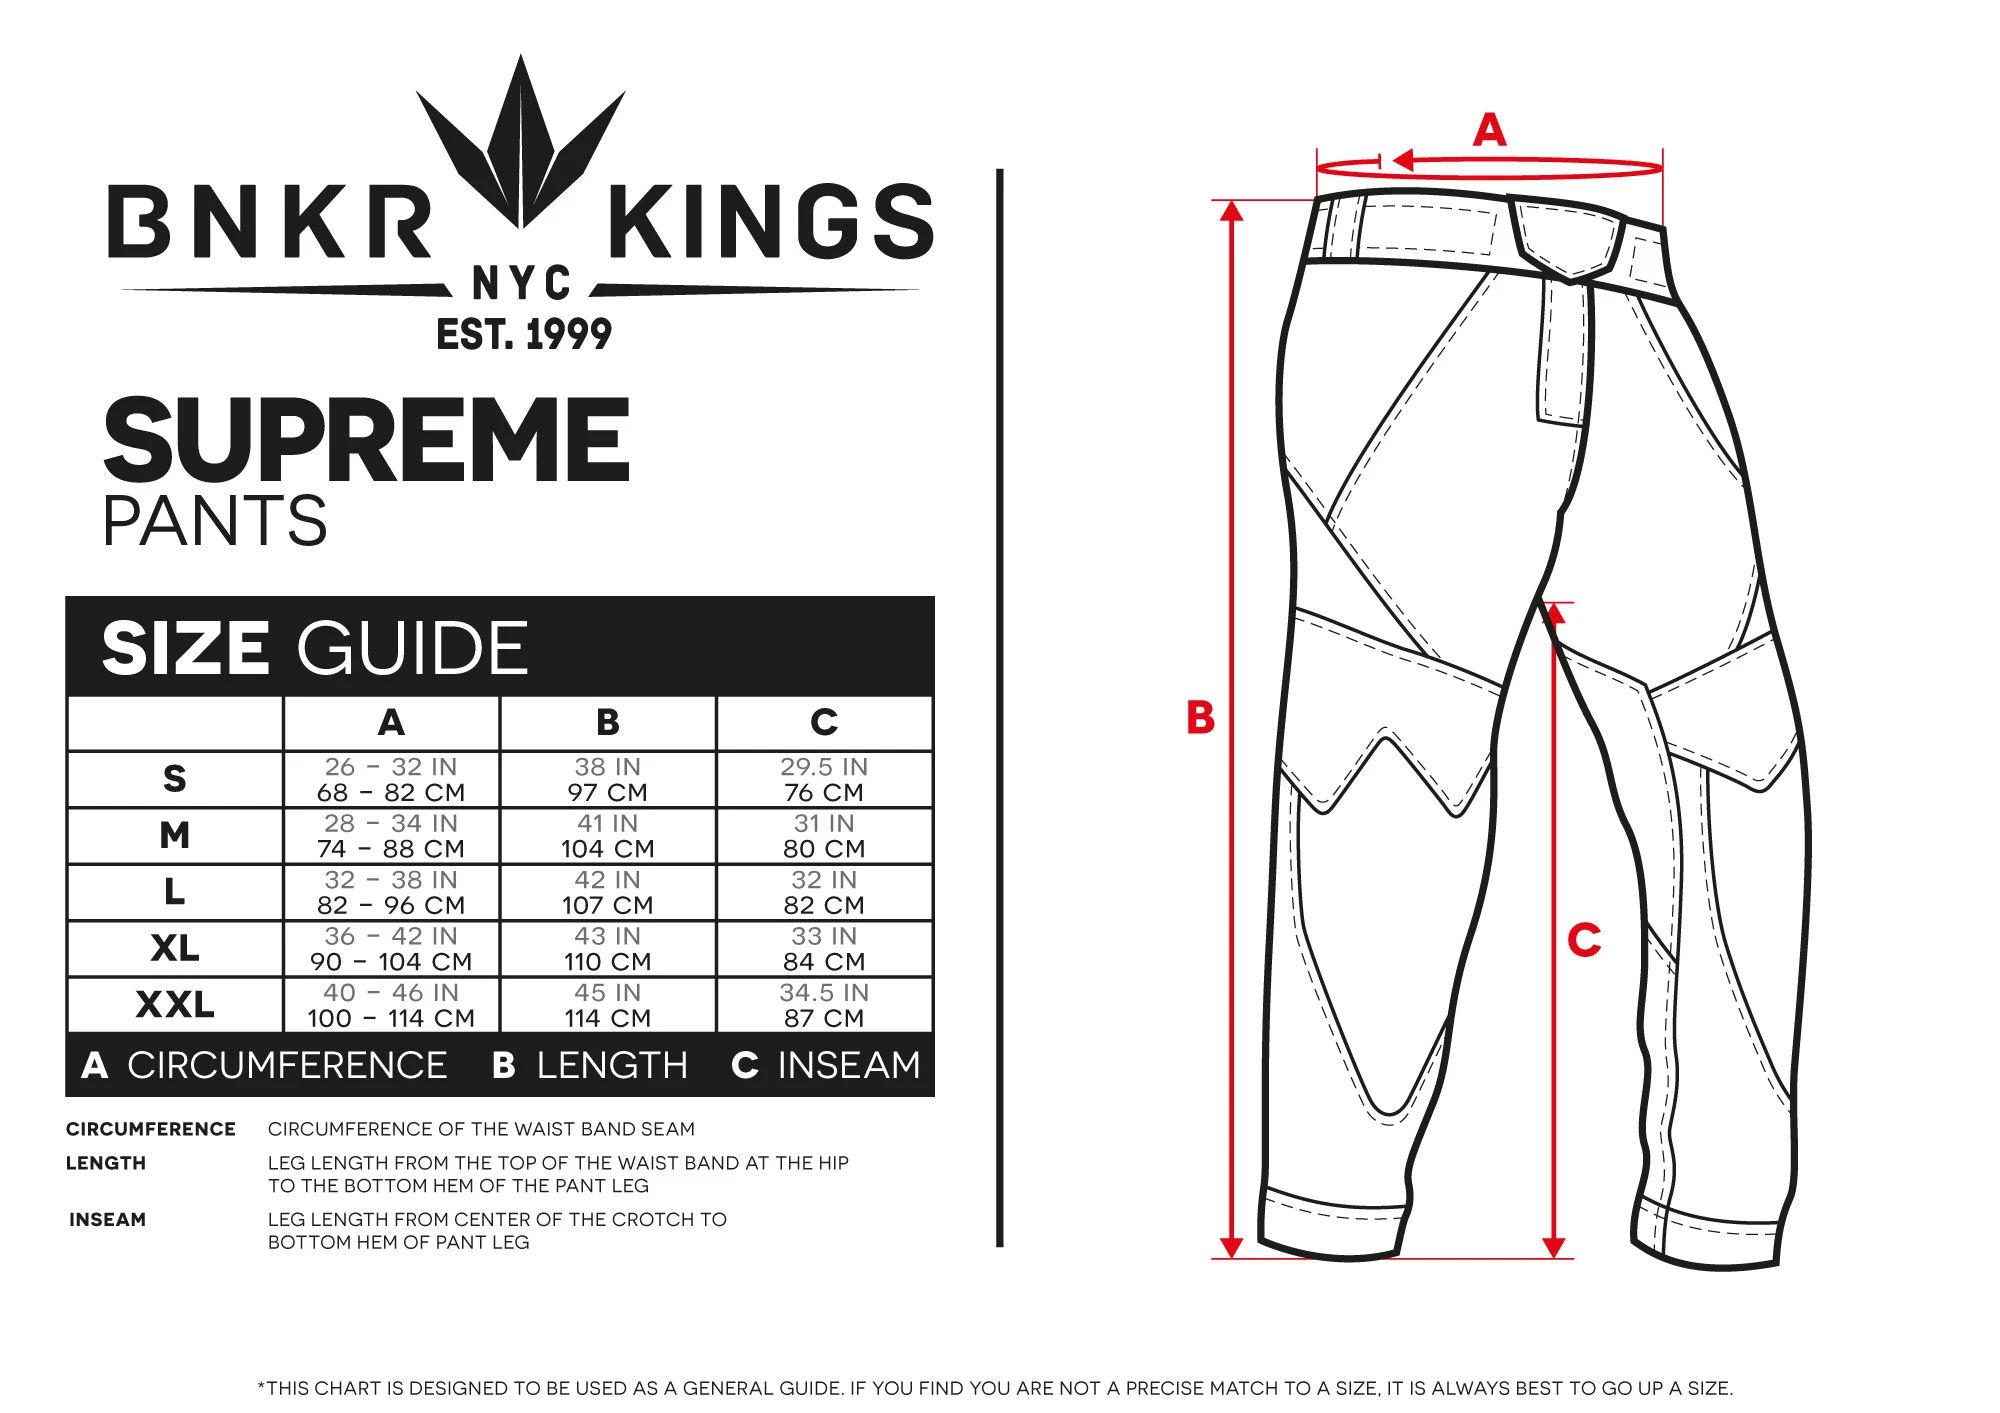 Bunkerkings Supreme Pants